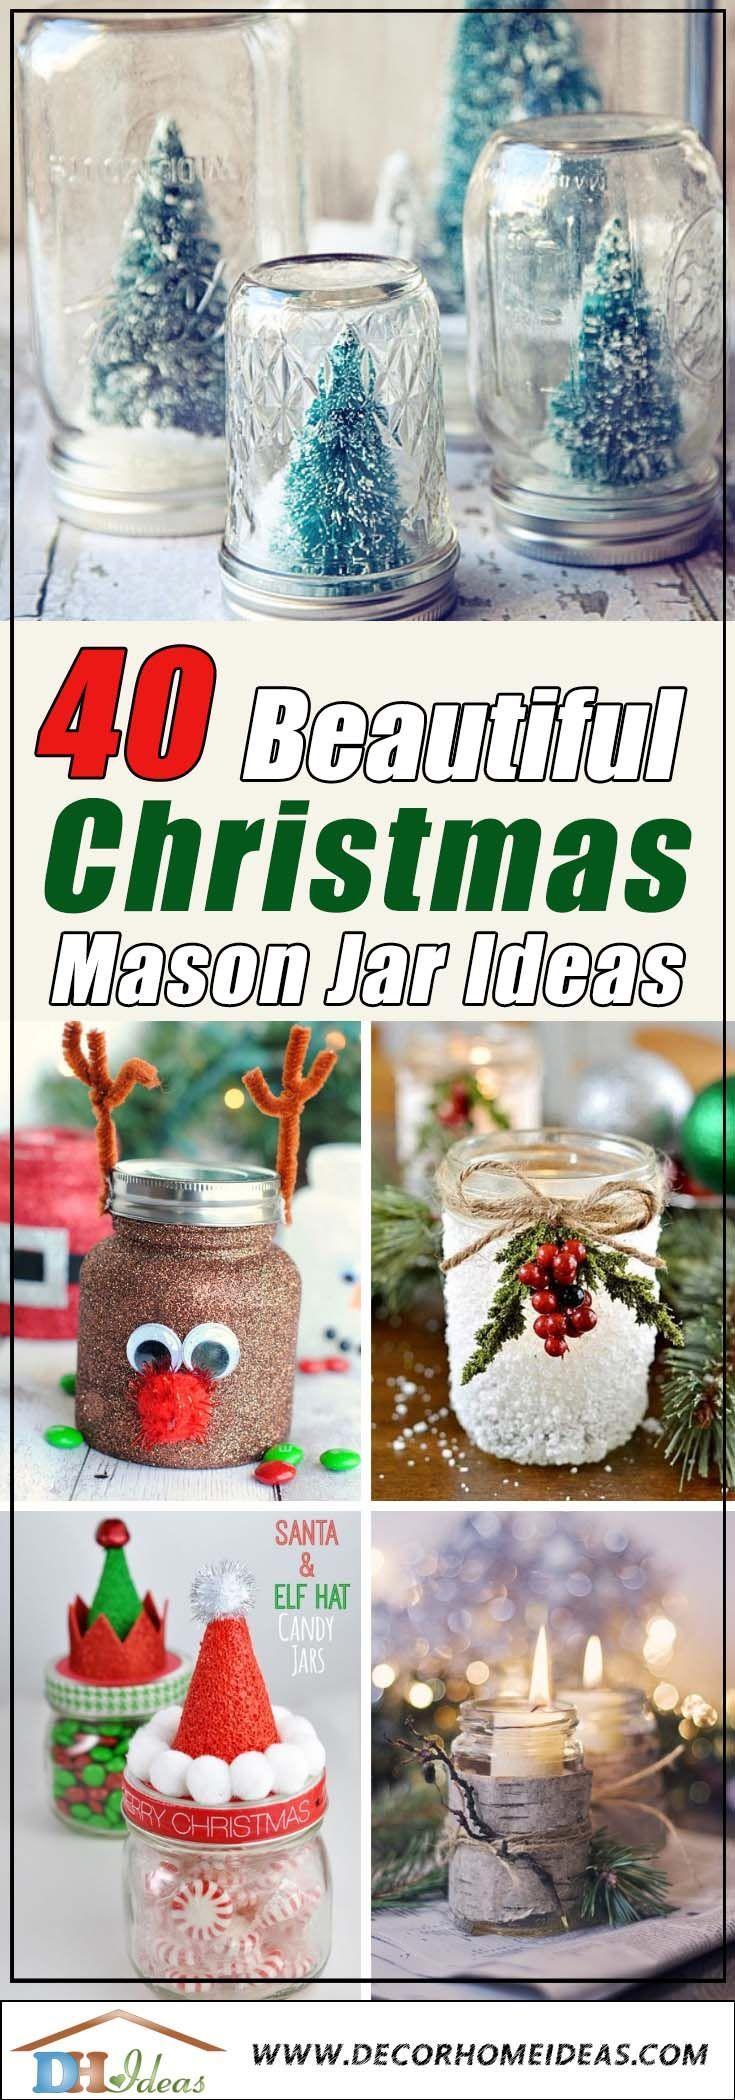 40 Beautiful Christmas Spirit Jars Ideas Decor Home Ideas Christmas Jars Christmas Mason Jars Homemade Christmas Candles